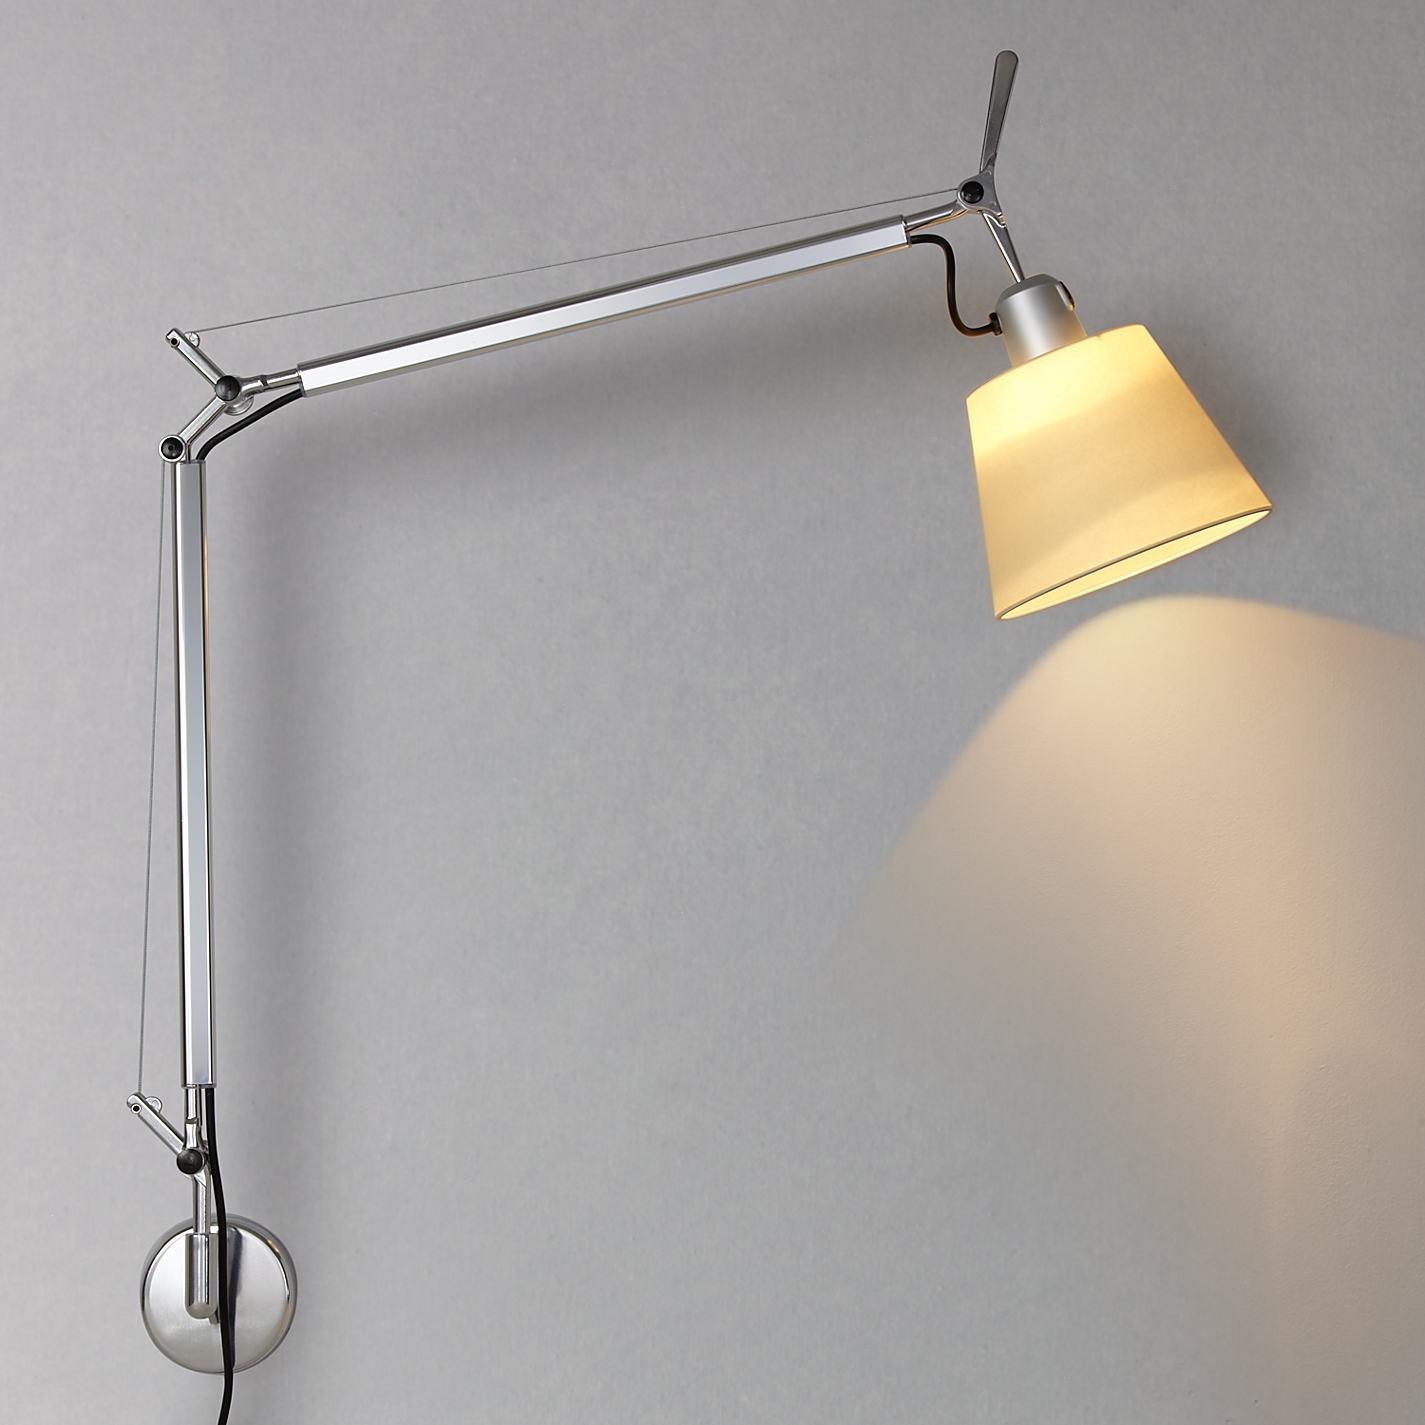 Artemide Tolomeo Basculante Wall Lamp Deplain Com